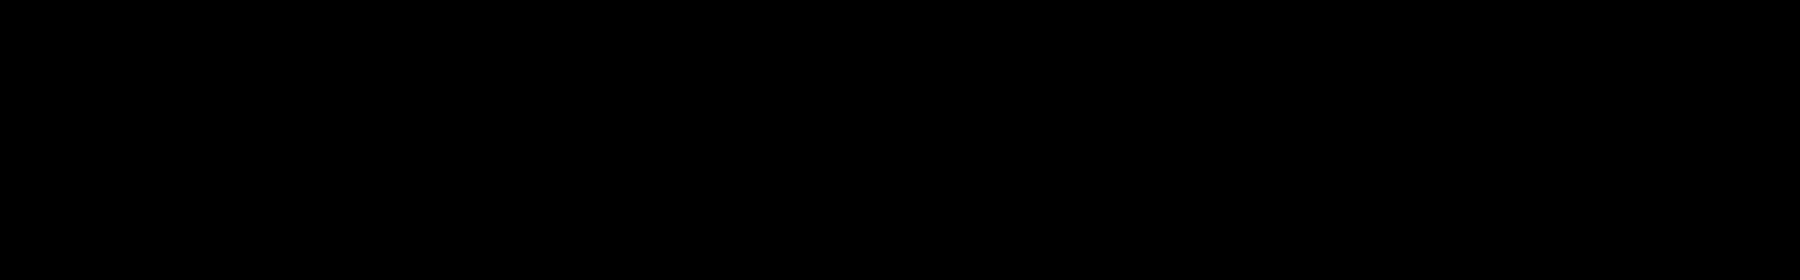 Clear View audio waveform